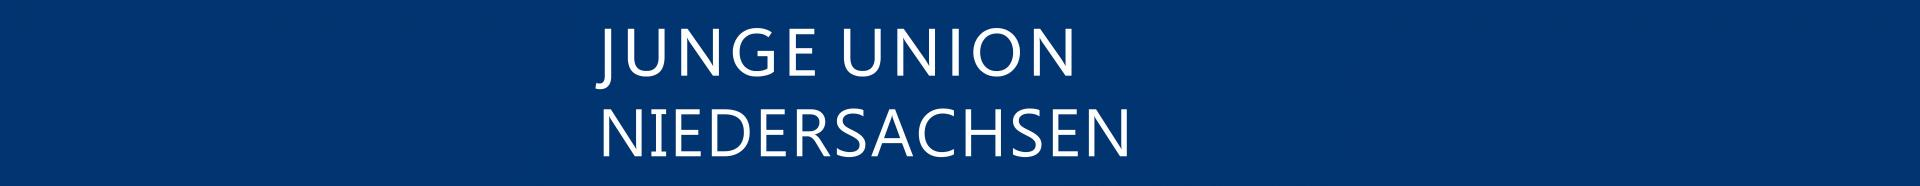 JU Niedersachsen Banner